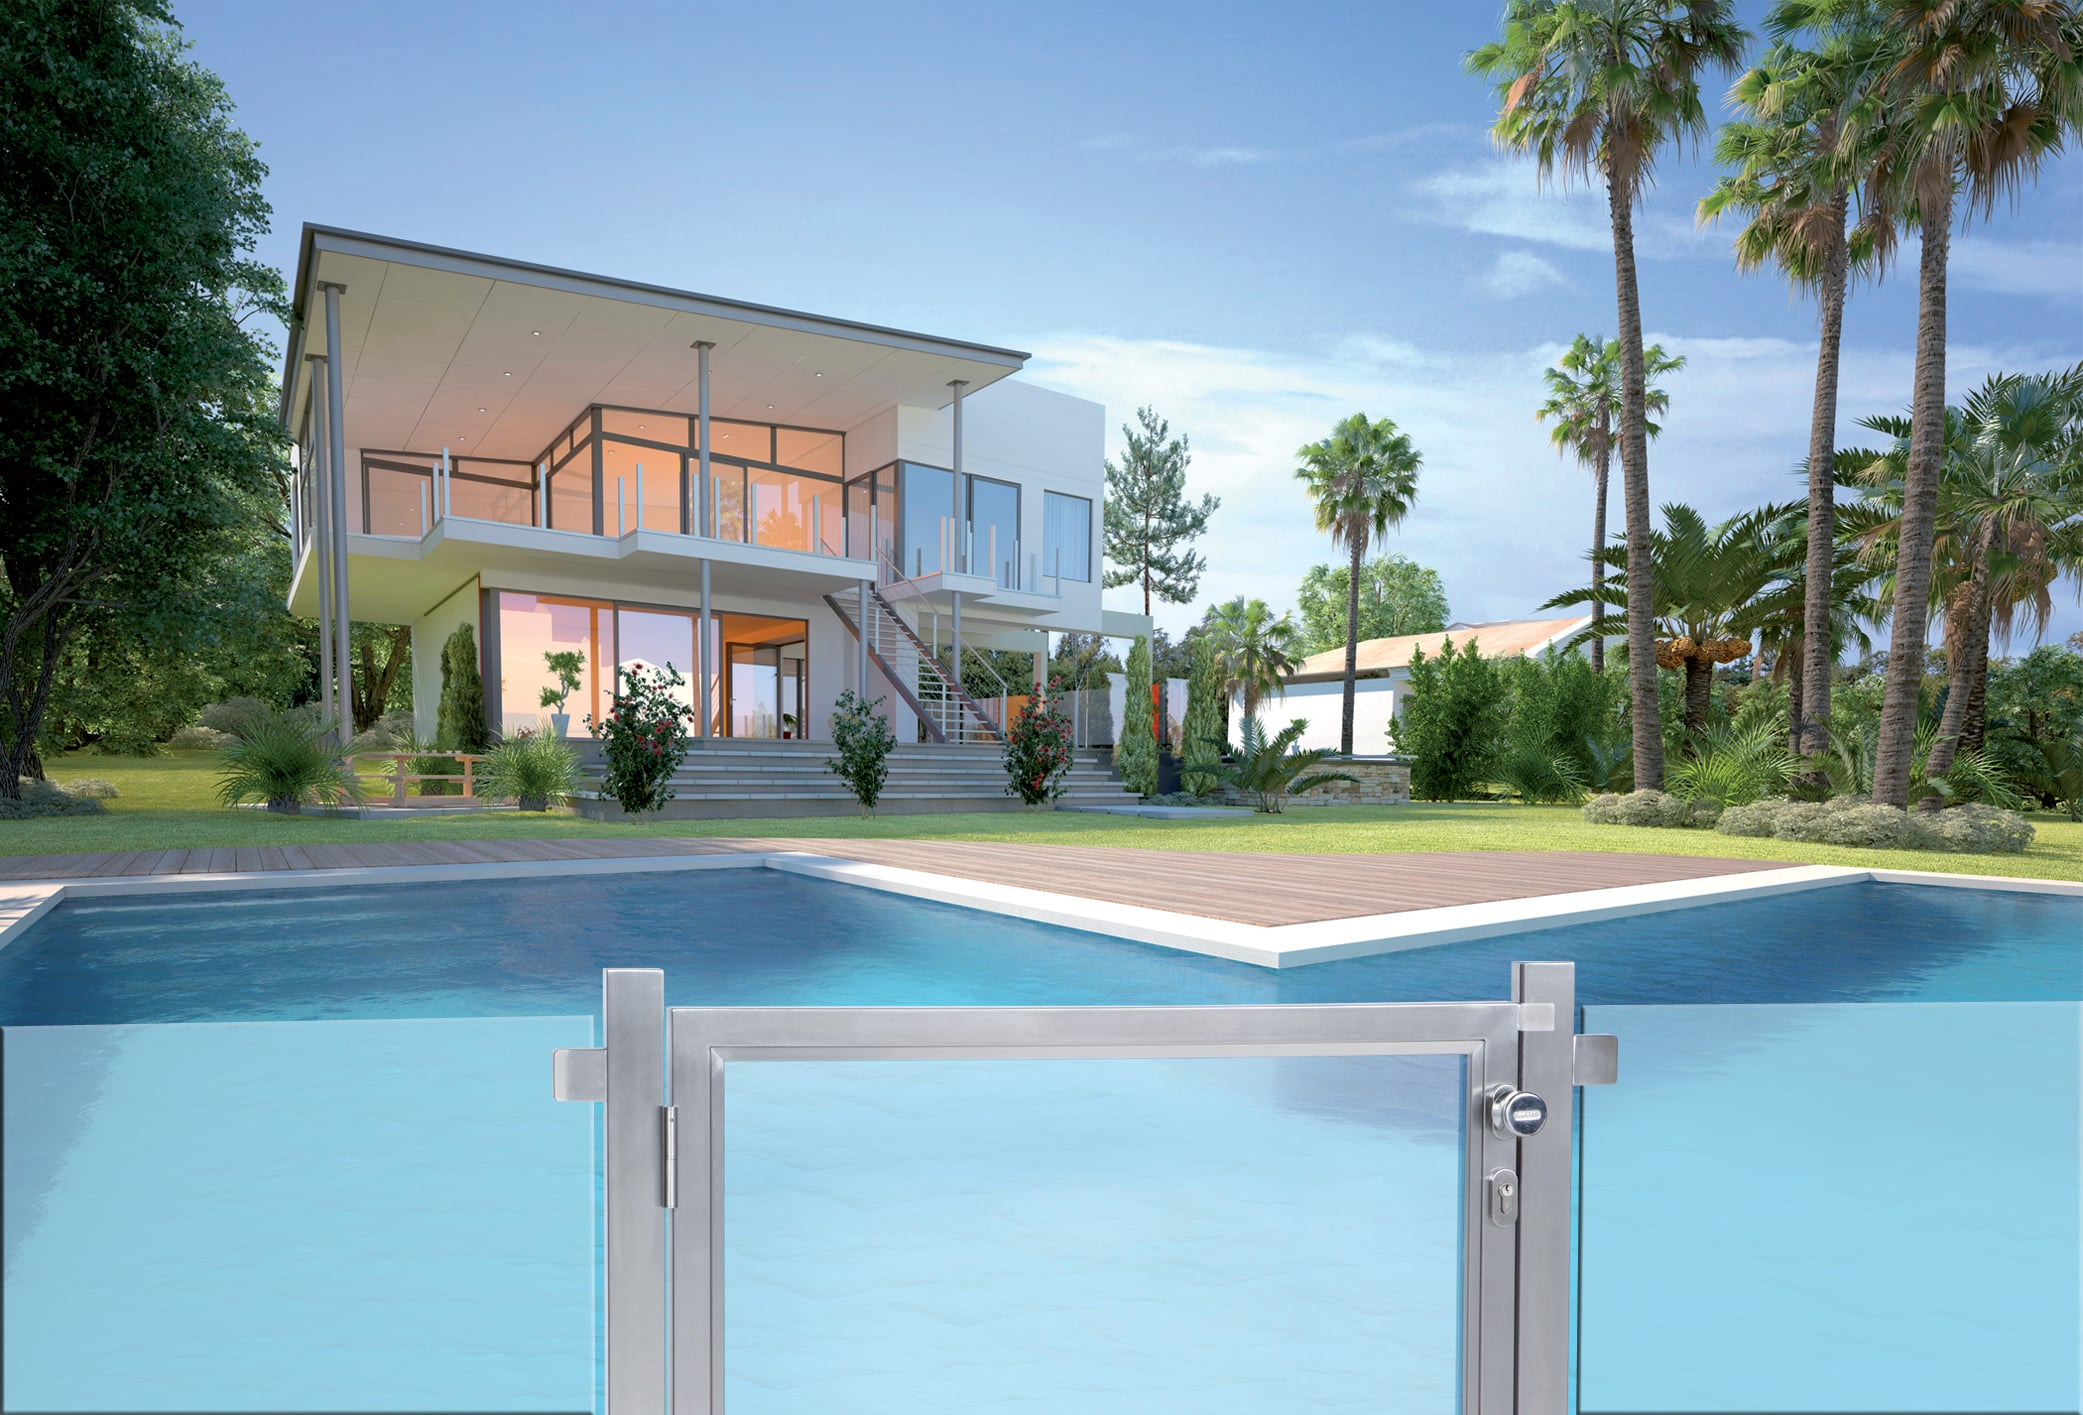 barriere piscine design les barri res de s curit piscine. Black Bedroom Furniture Sets. Home Design Ideas